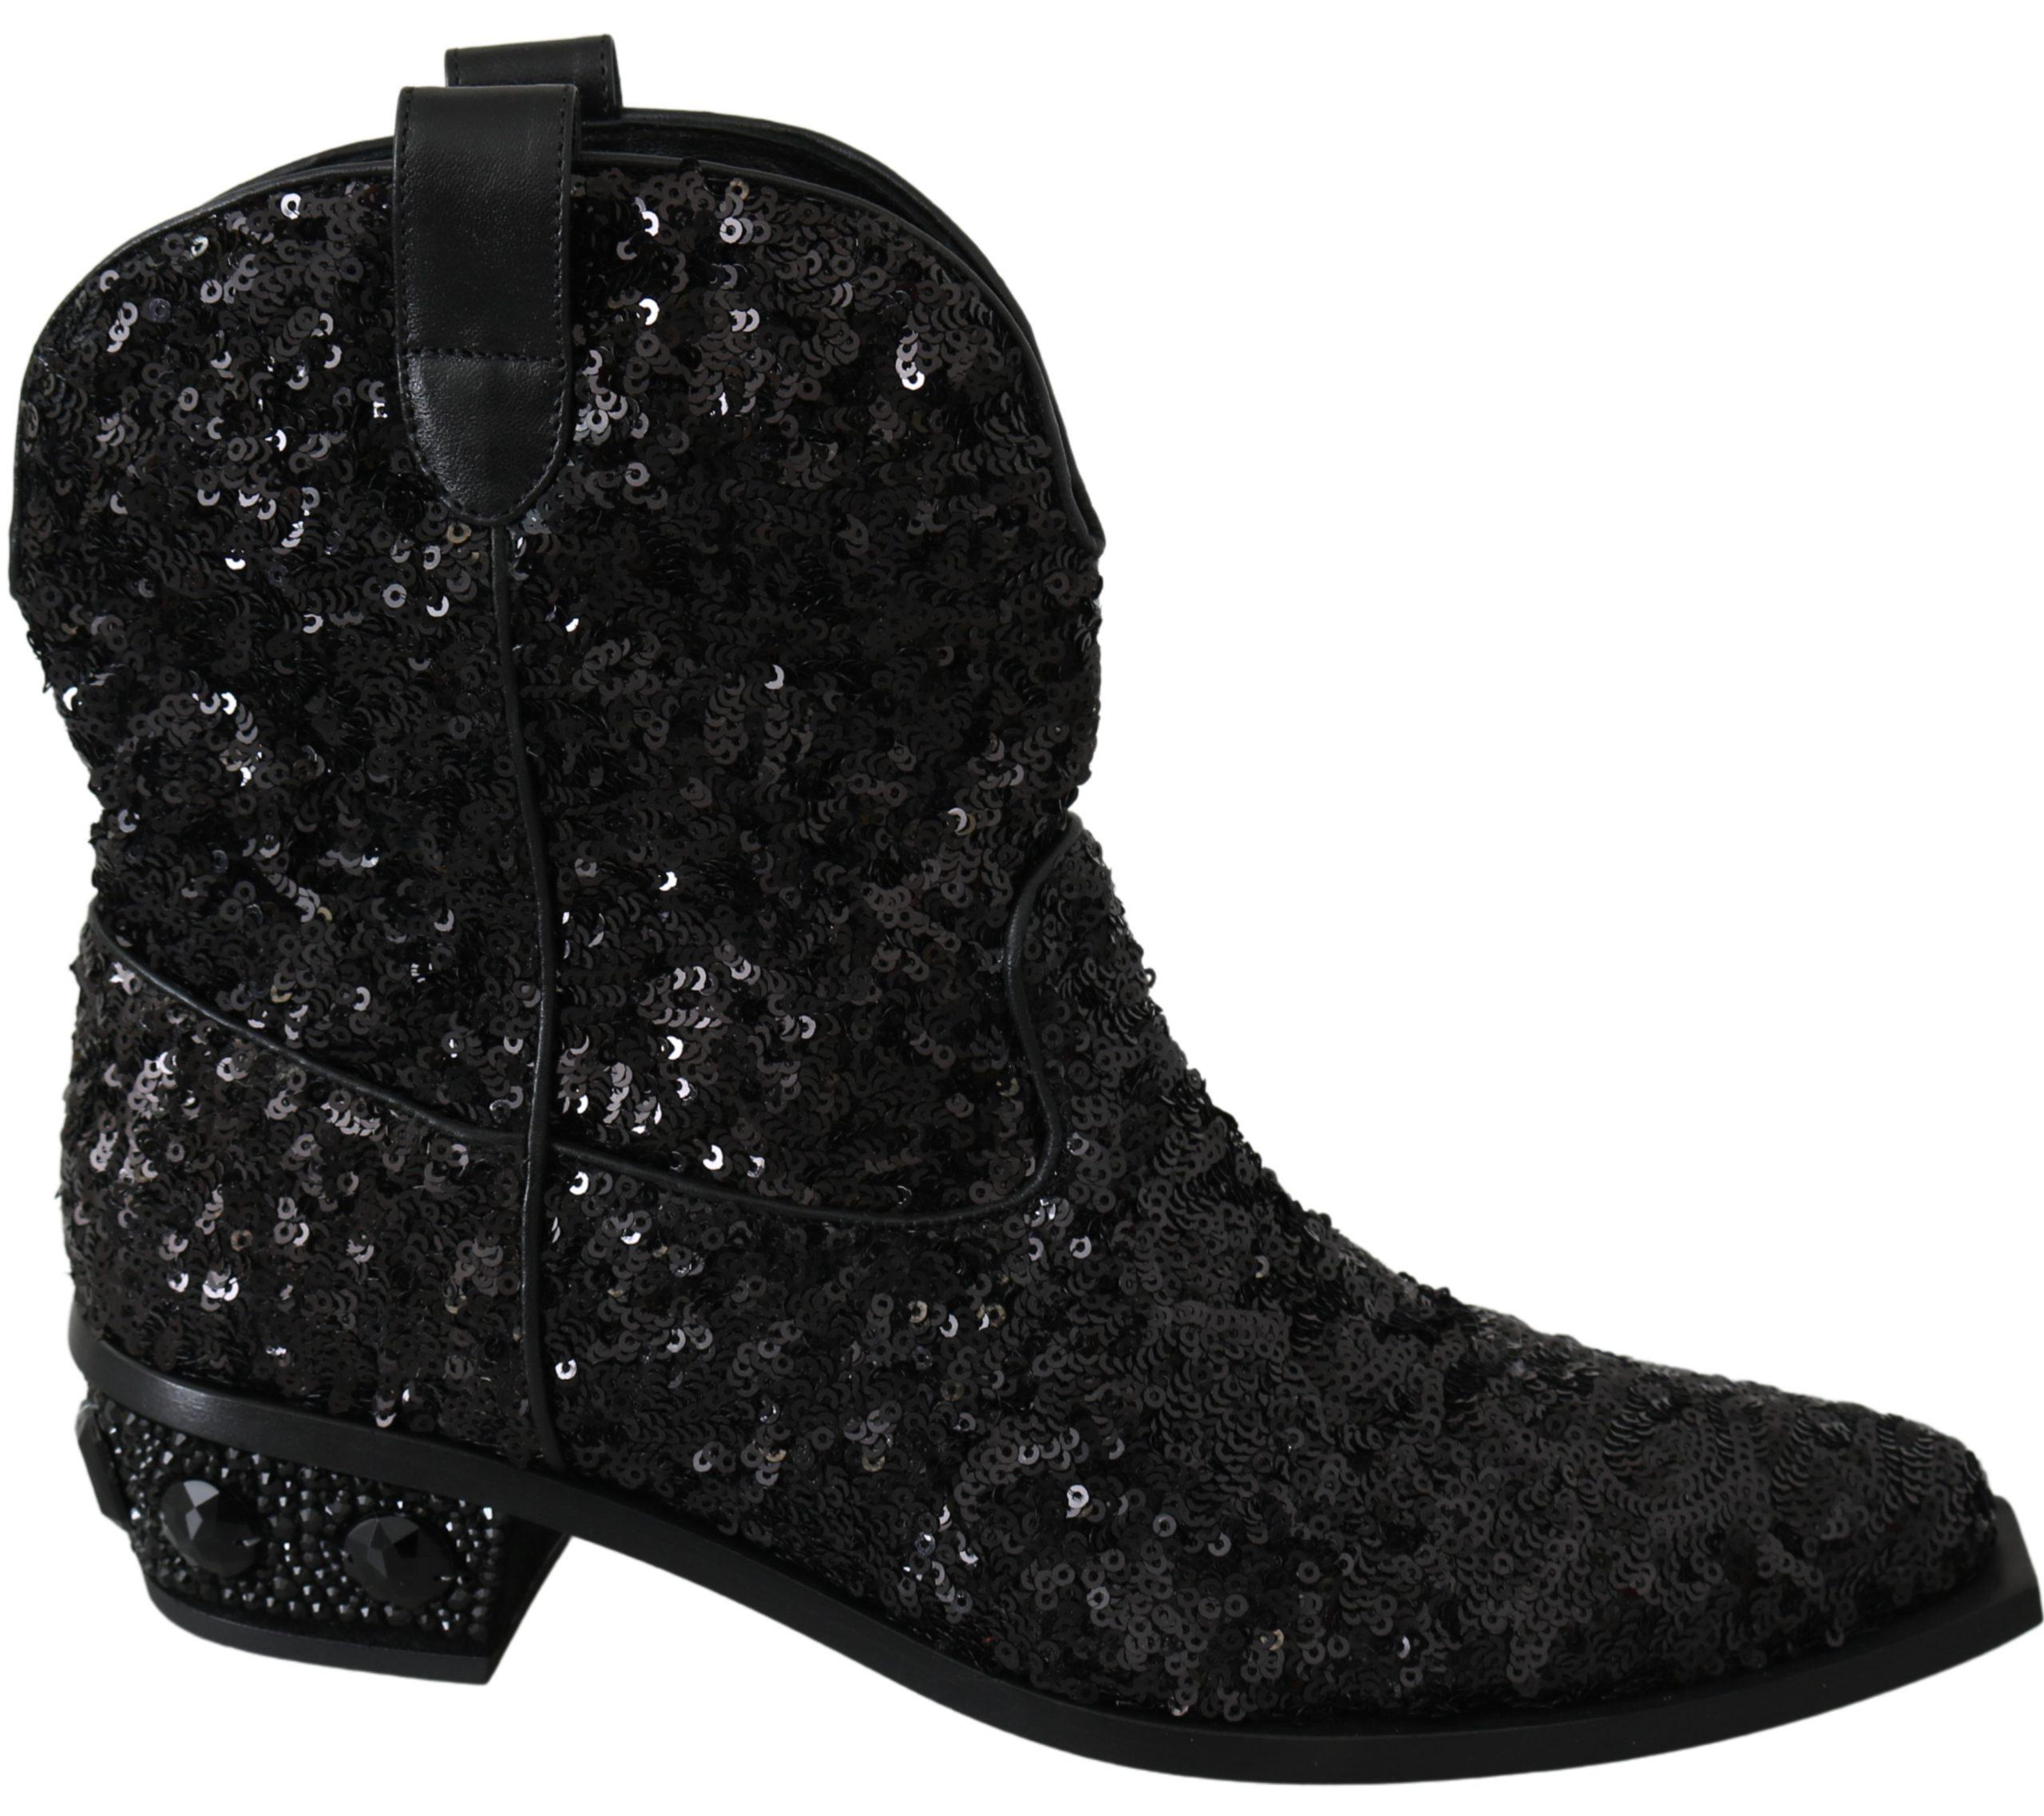 Black Sequined Boots Cowboy Shoes - EU37/US6.5